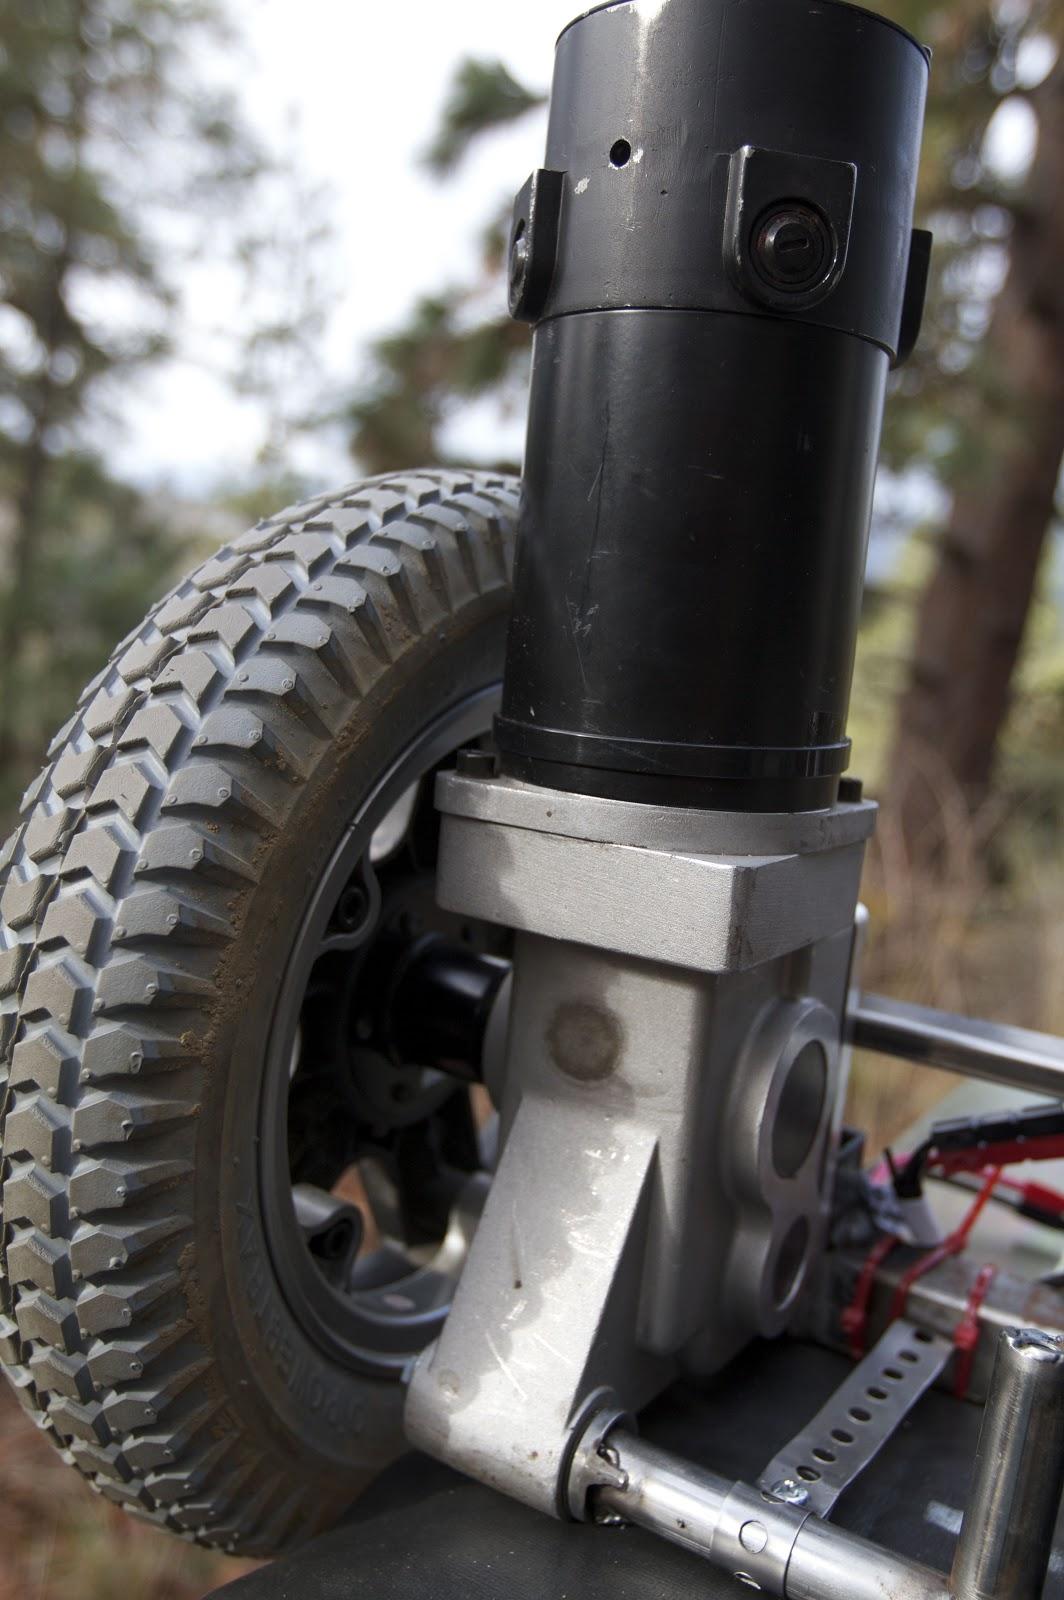 Wheelchair Motor Portable Wheel Chair Ramp 2 Self Balancer Using Motors Glenns Garage